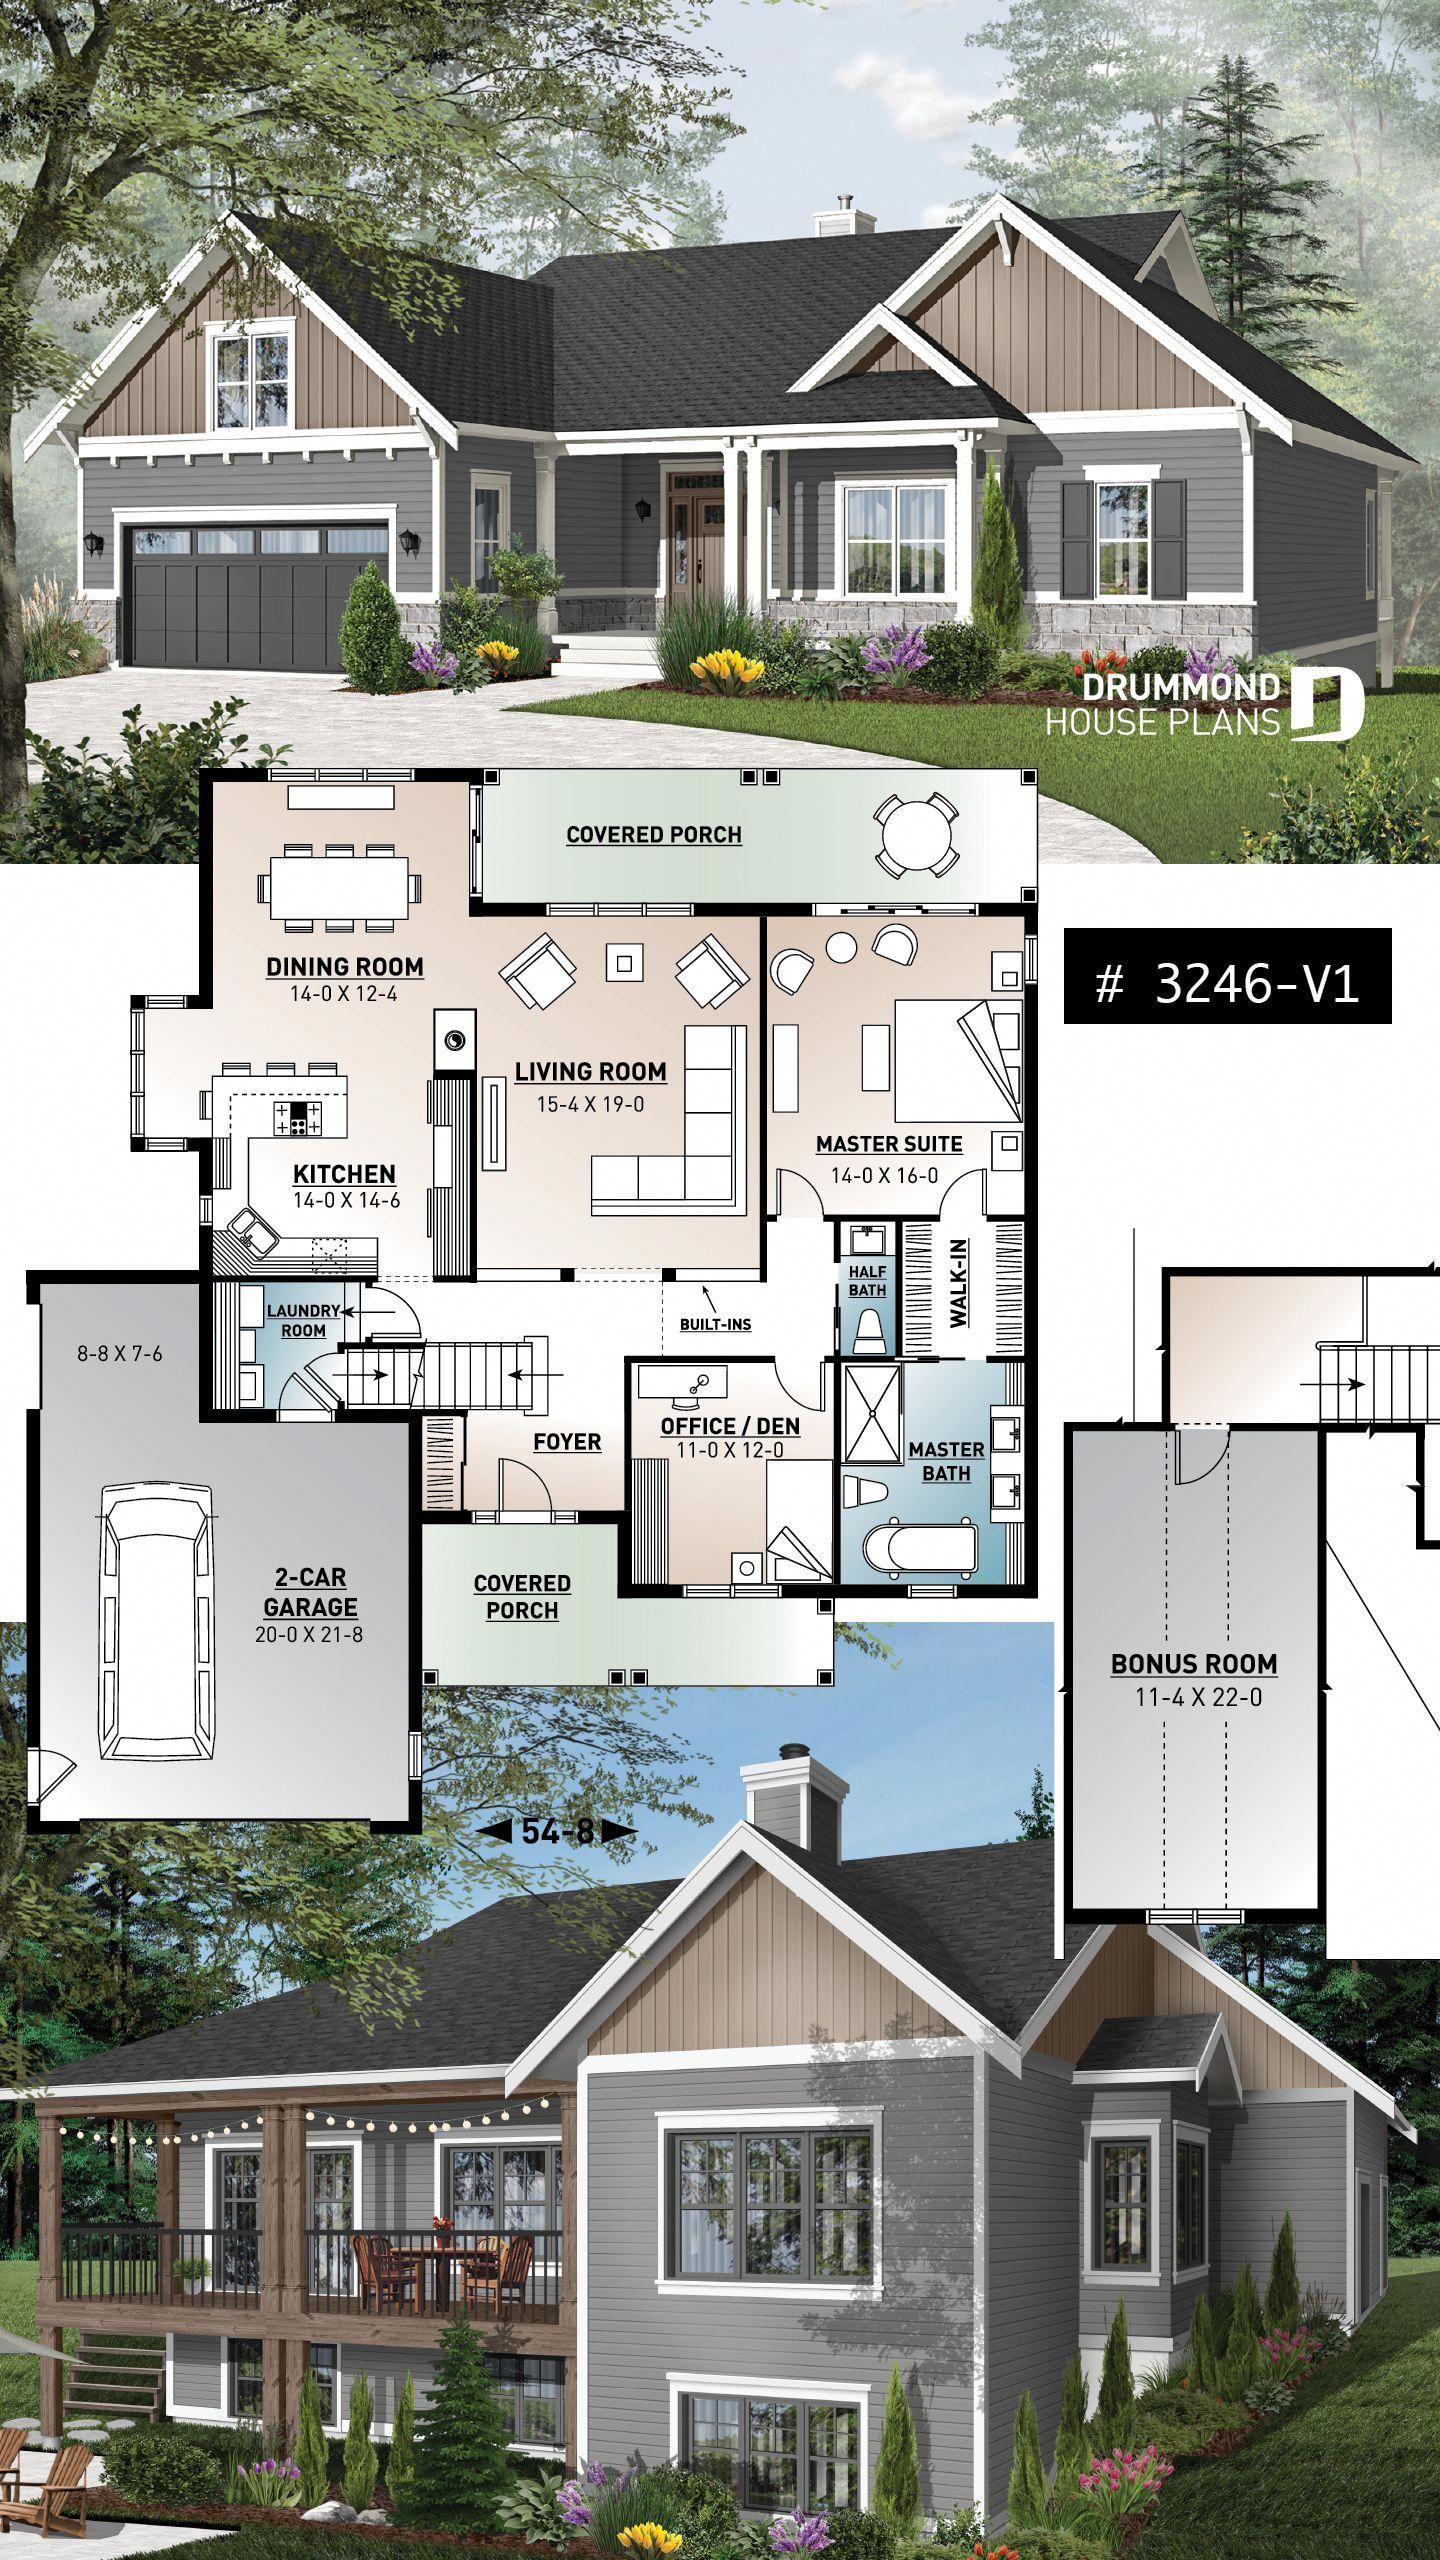 Basement Finishing Ideas in 2020 | Craftsman house plans ...